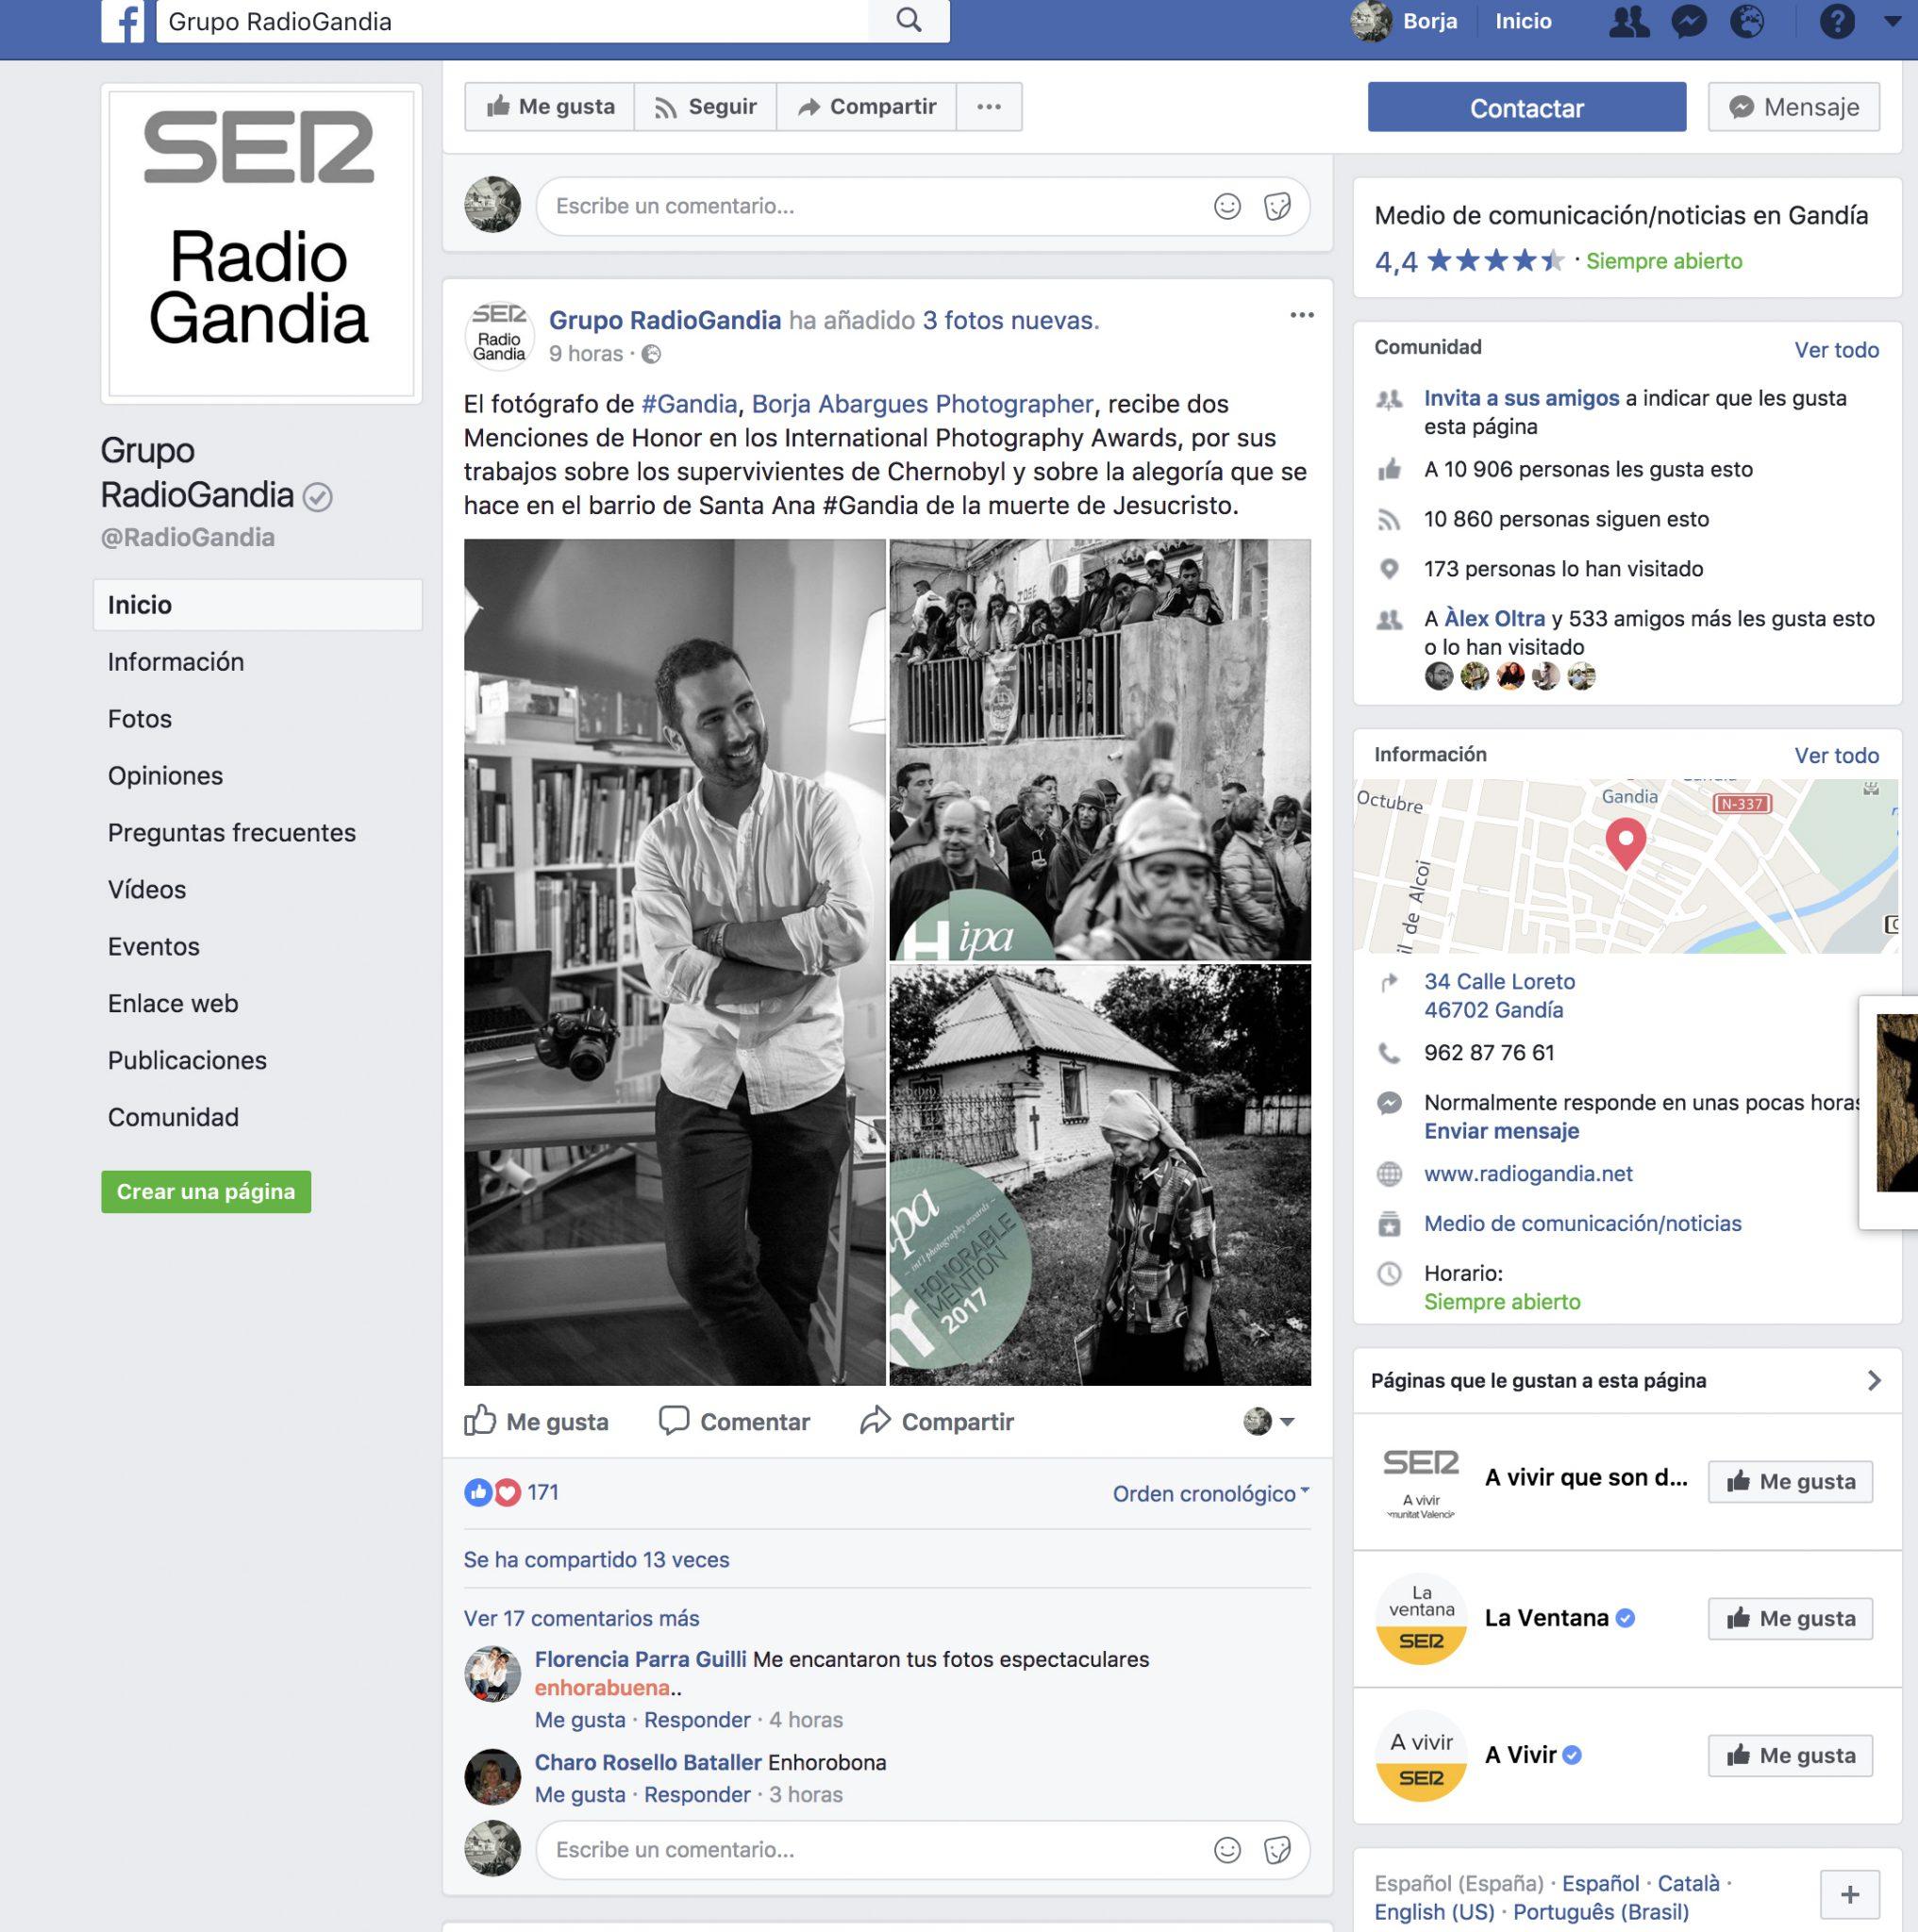 Cadena Ser Radio Gandia 2017-10-11